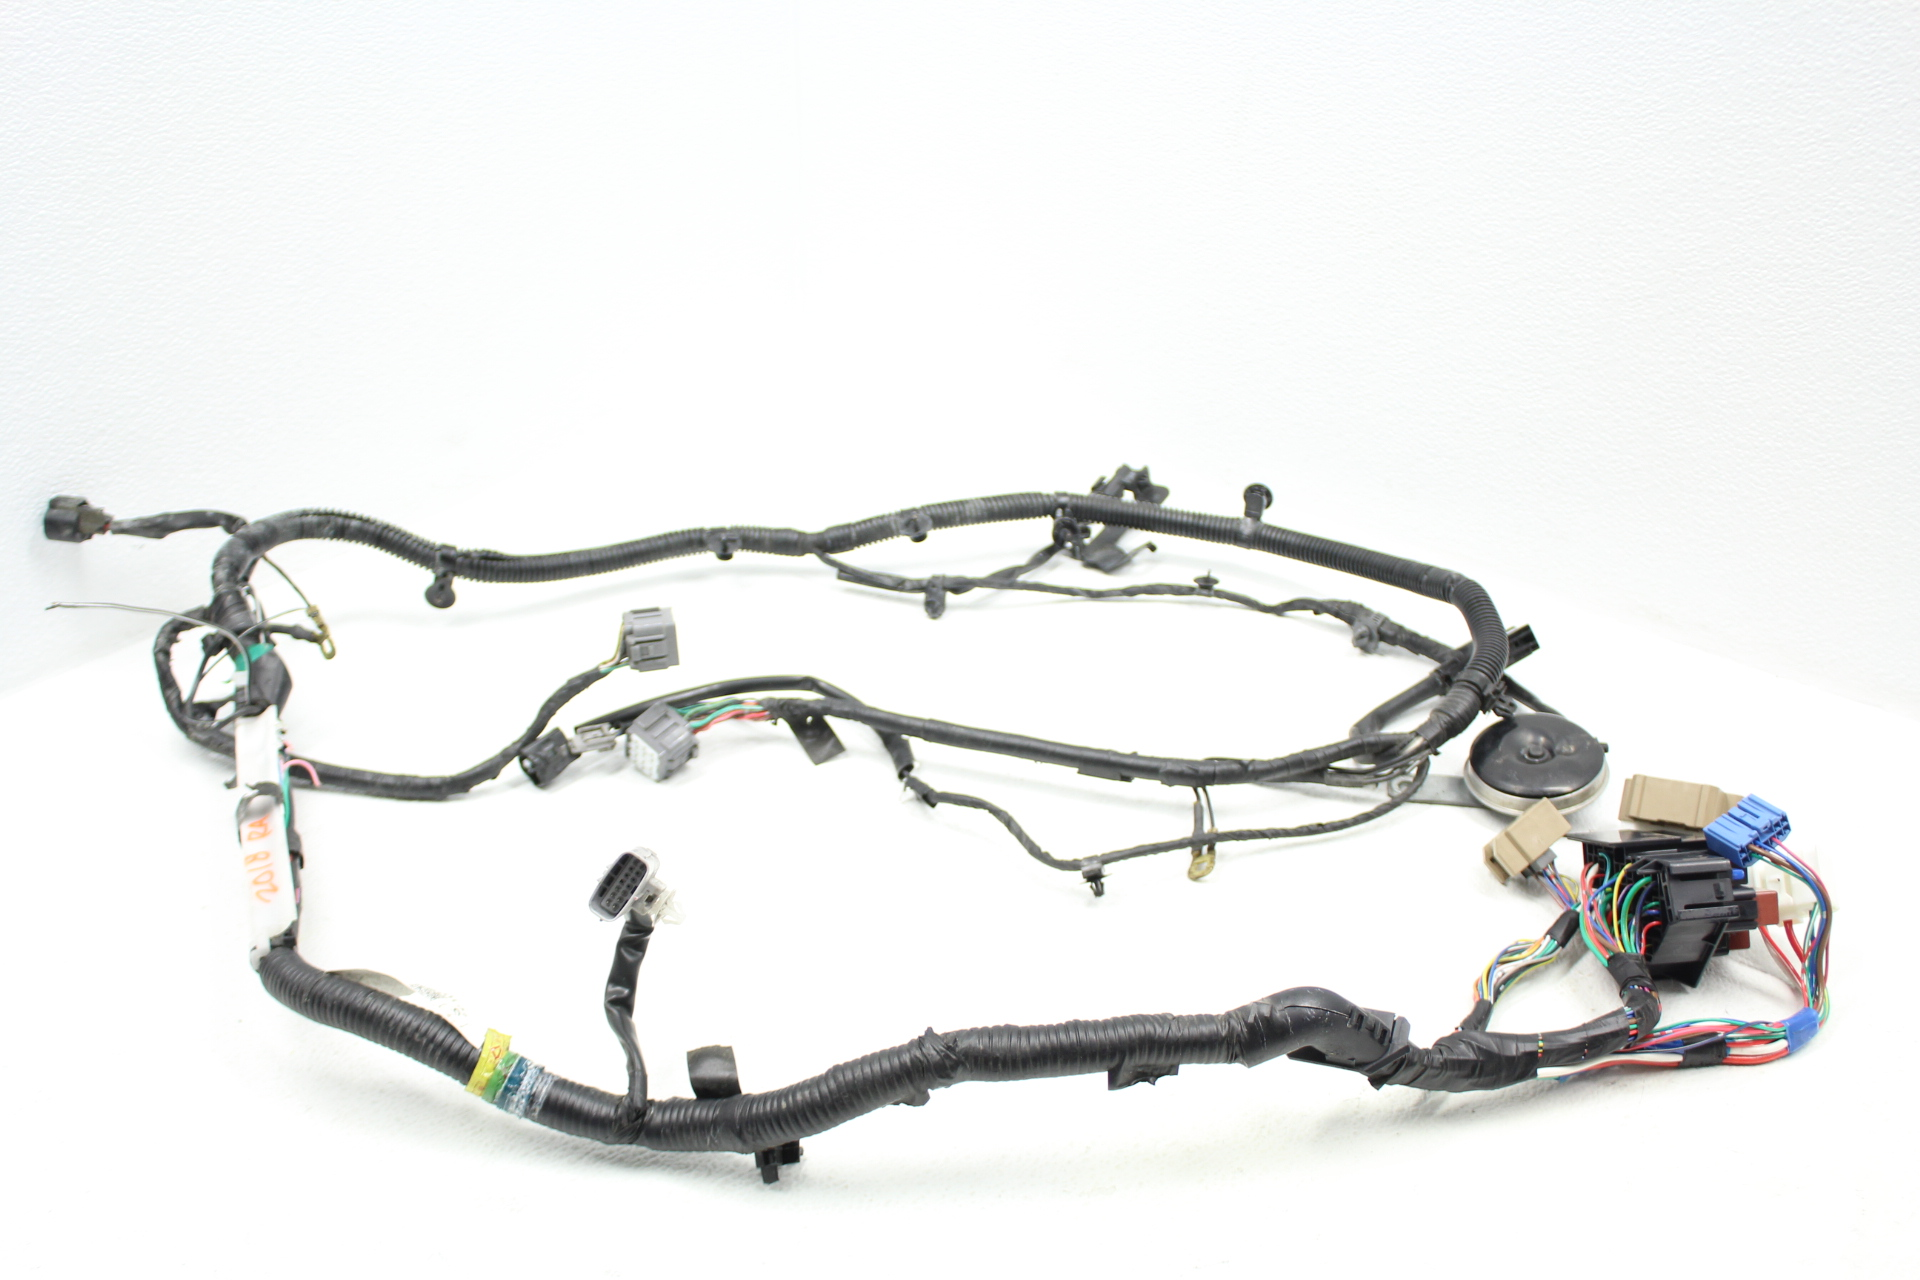 [DIAGRAM] 2006 Subaru Wrx Sti Ecu Pinout Diagrams